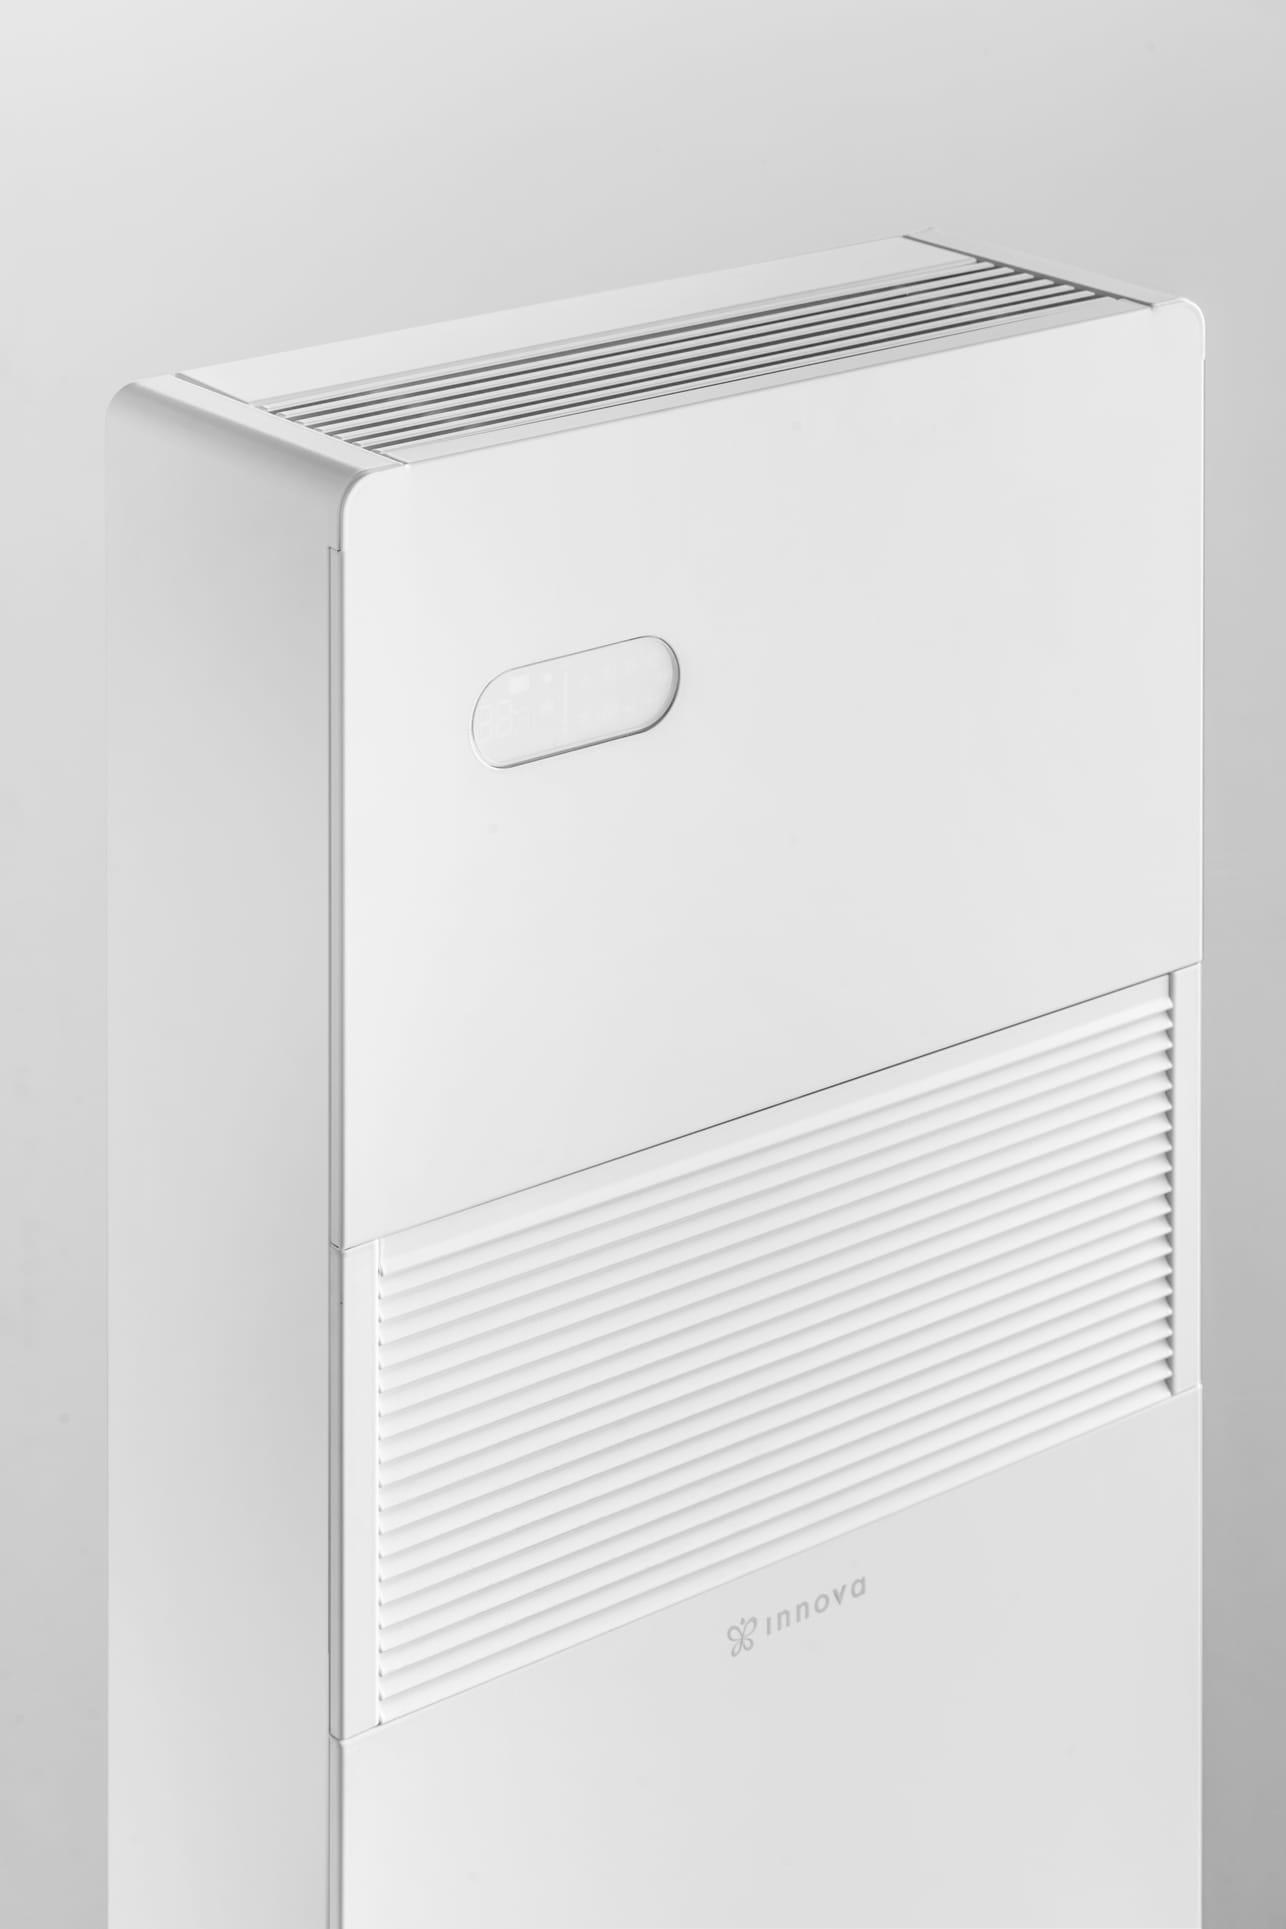 Green House Solutions zonnepanelen batterijopslag laadpalen airconditioning mac84331 web